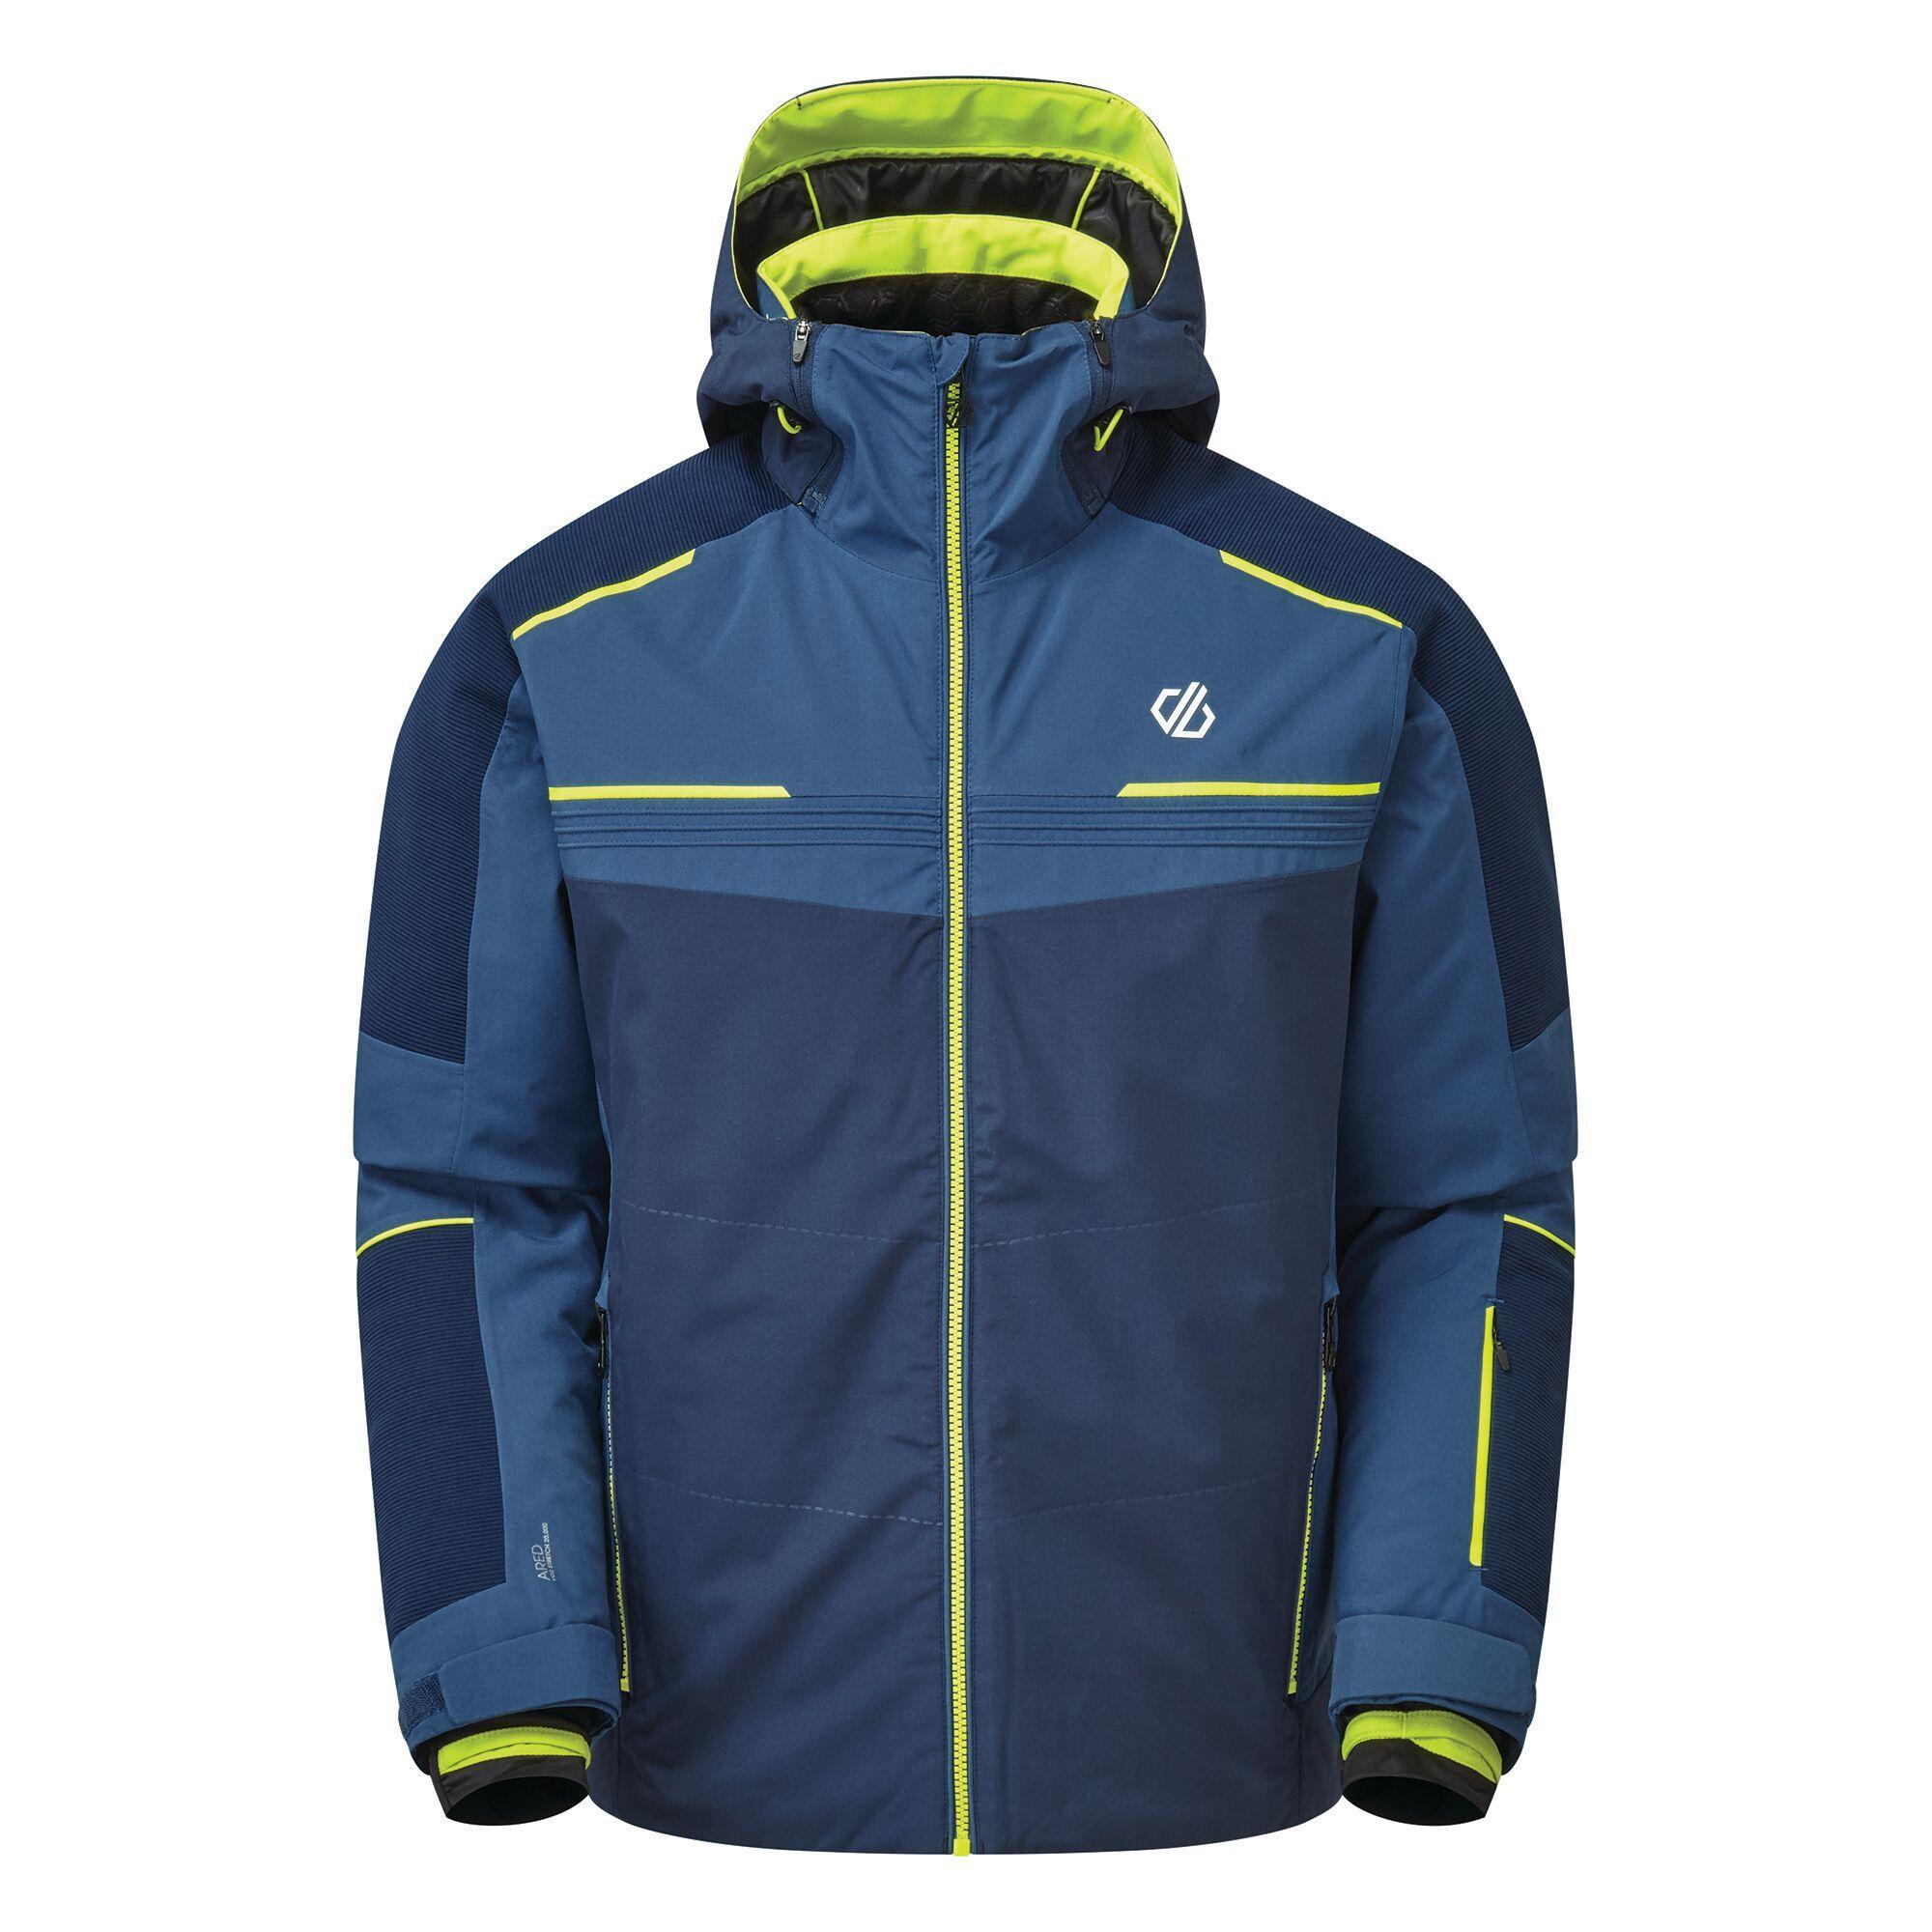 Regatta Mens Below Zero Insulated Ski Jacket (XS) (Nightfall Navy/Dark Denim)